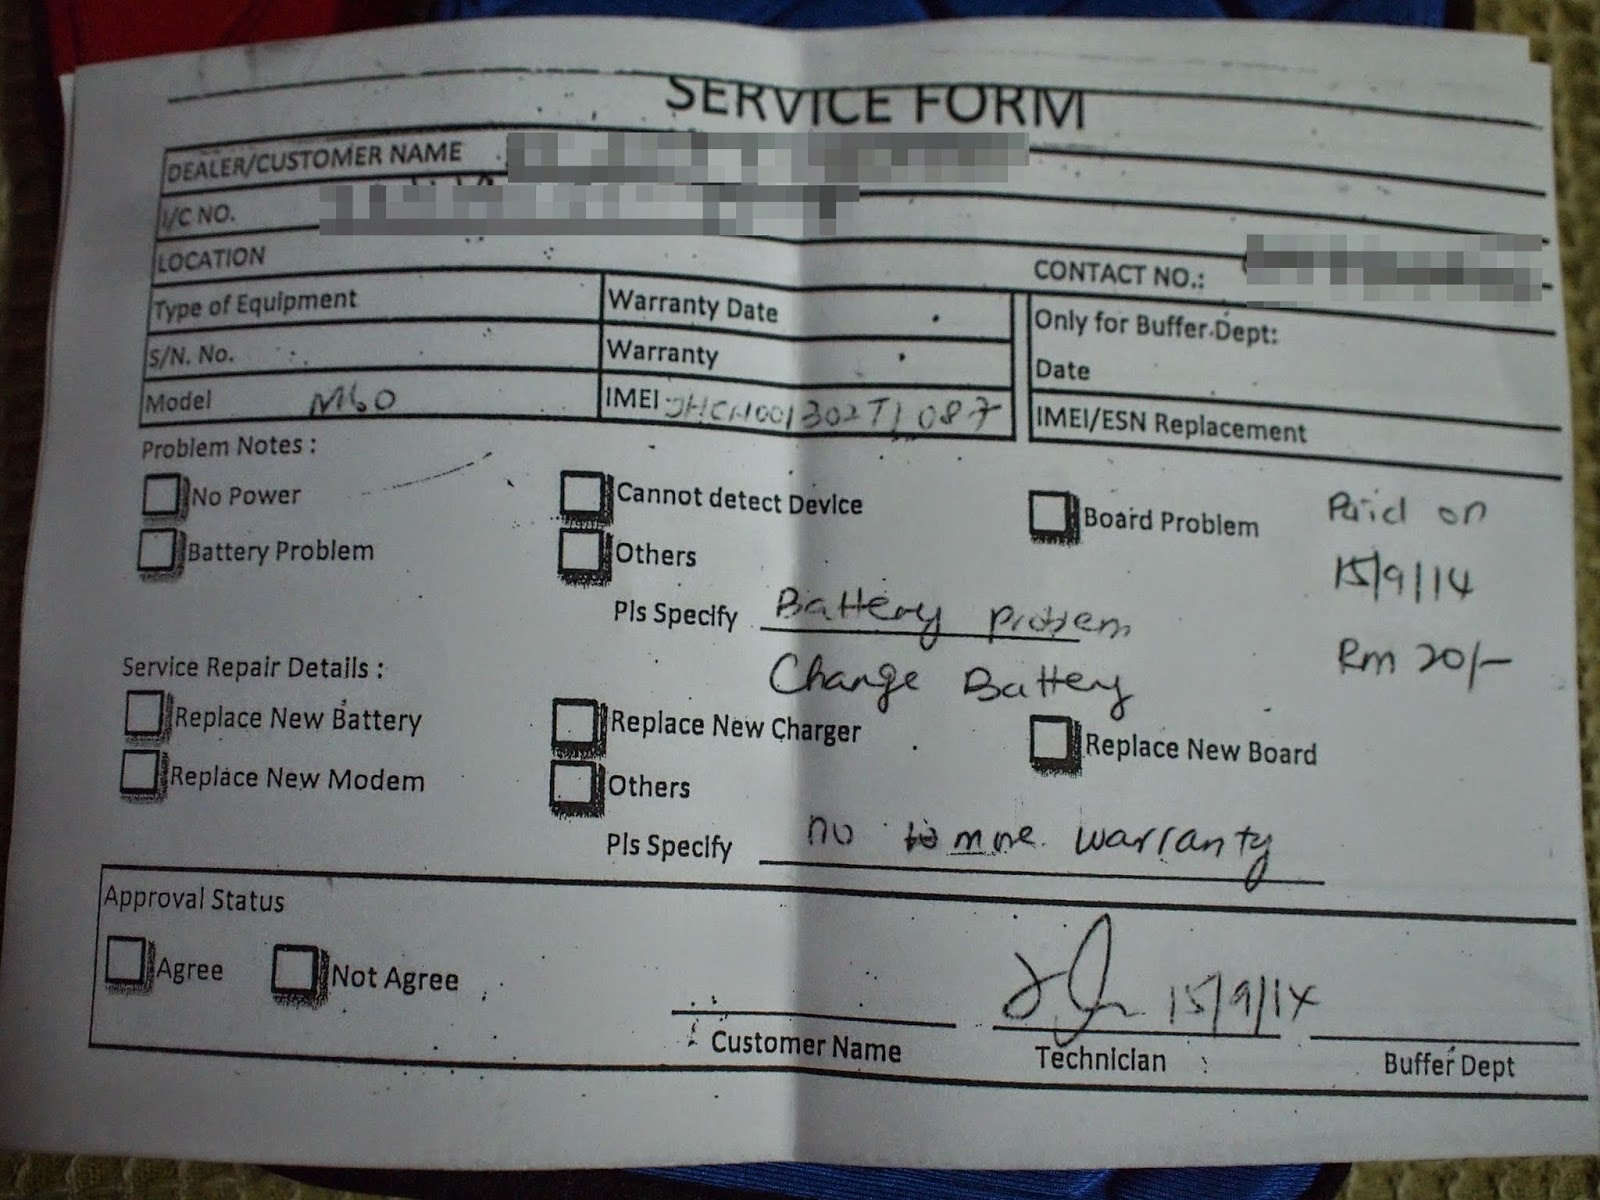 aigoPad M60 - Service Form Ten Ten Telecommunicatons Sdn. Bhd.